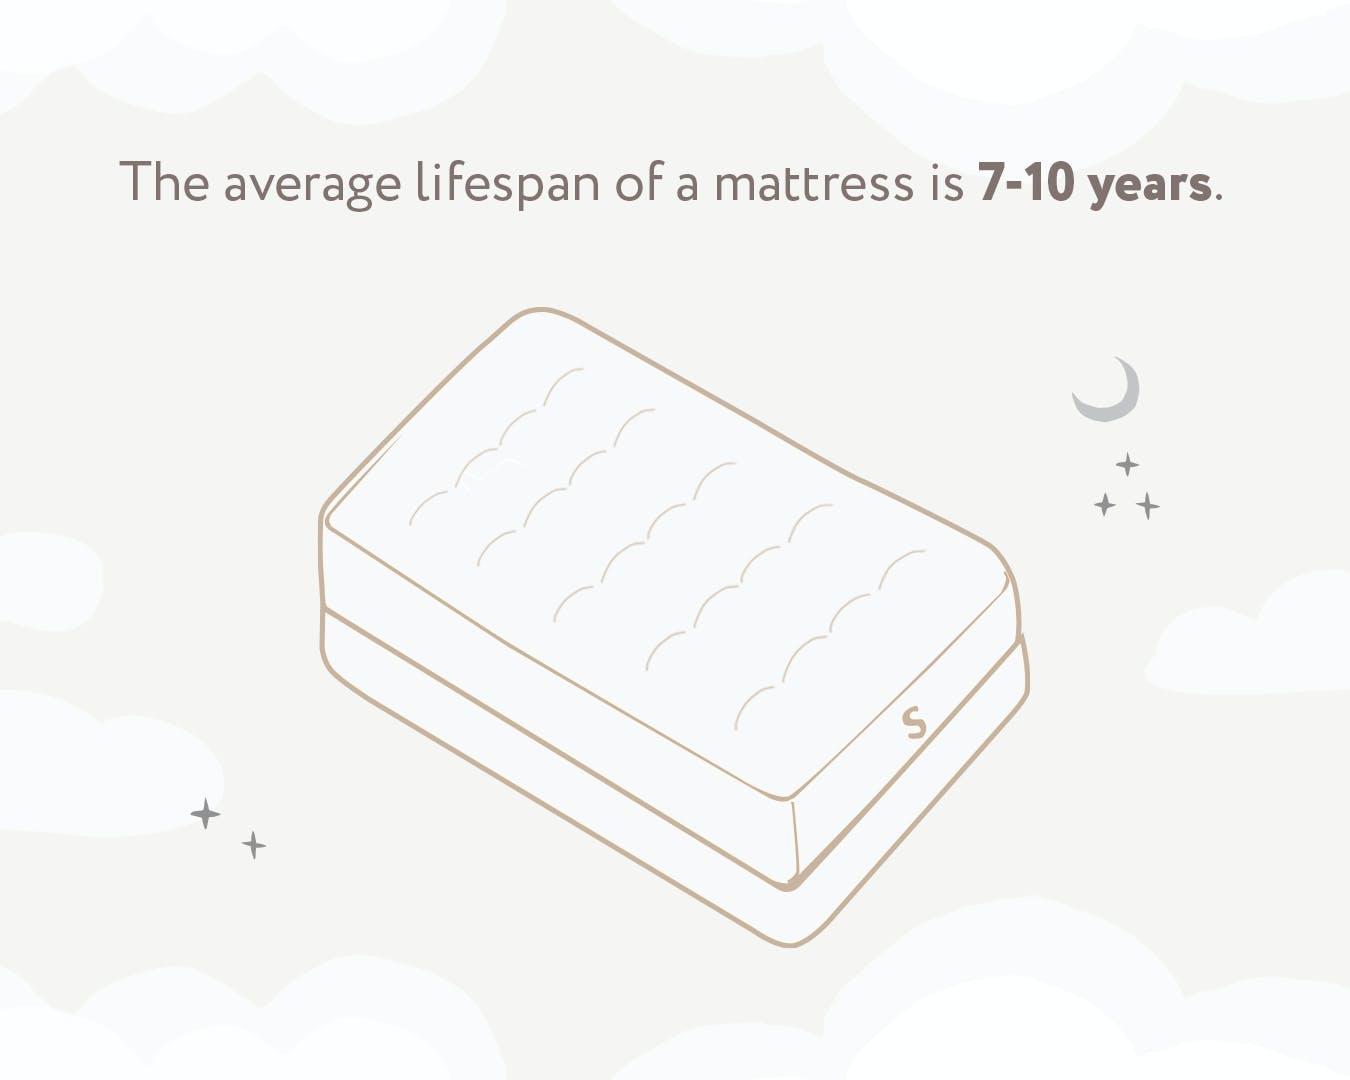 illustration showing the average lifespan of a mattress